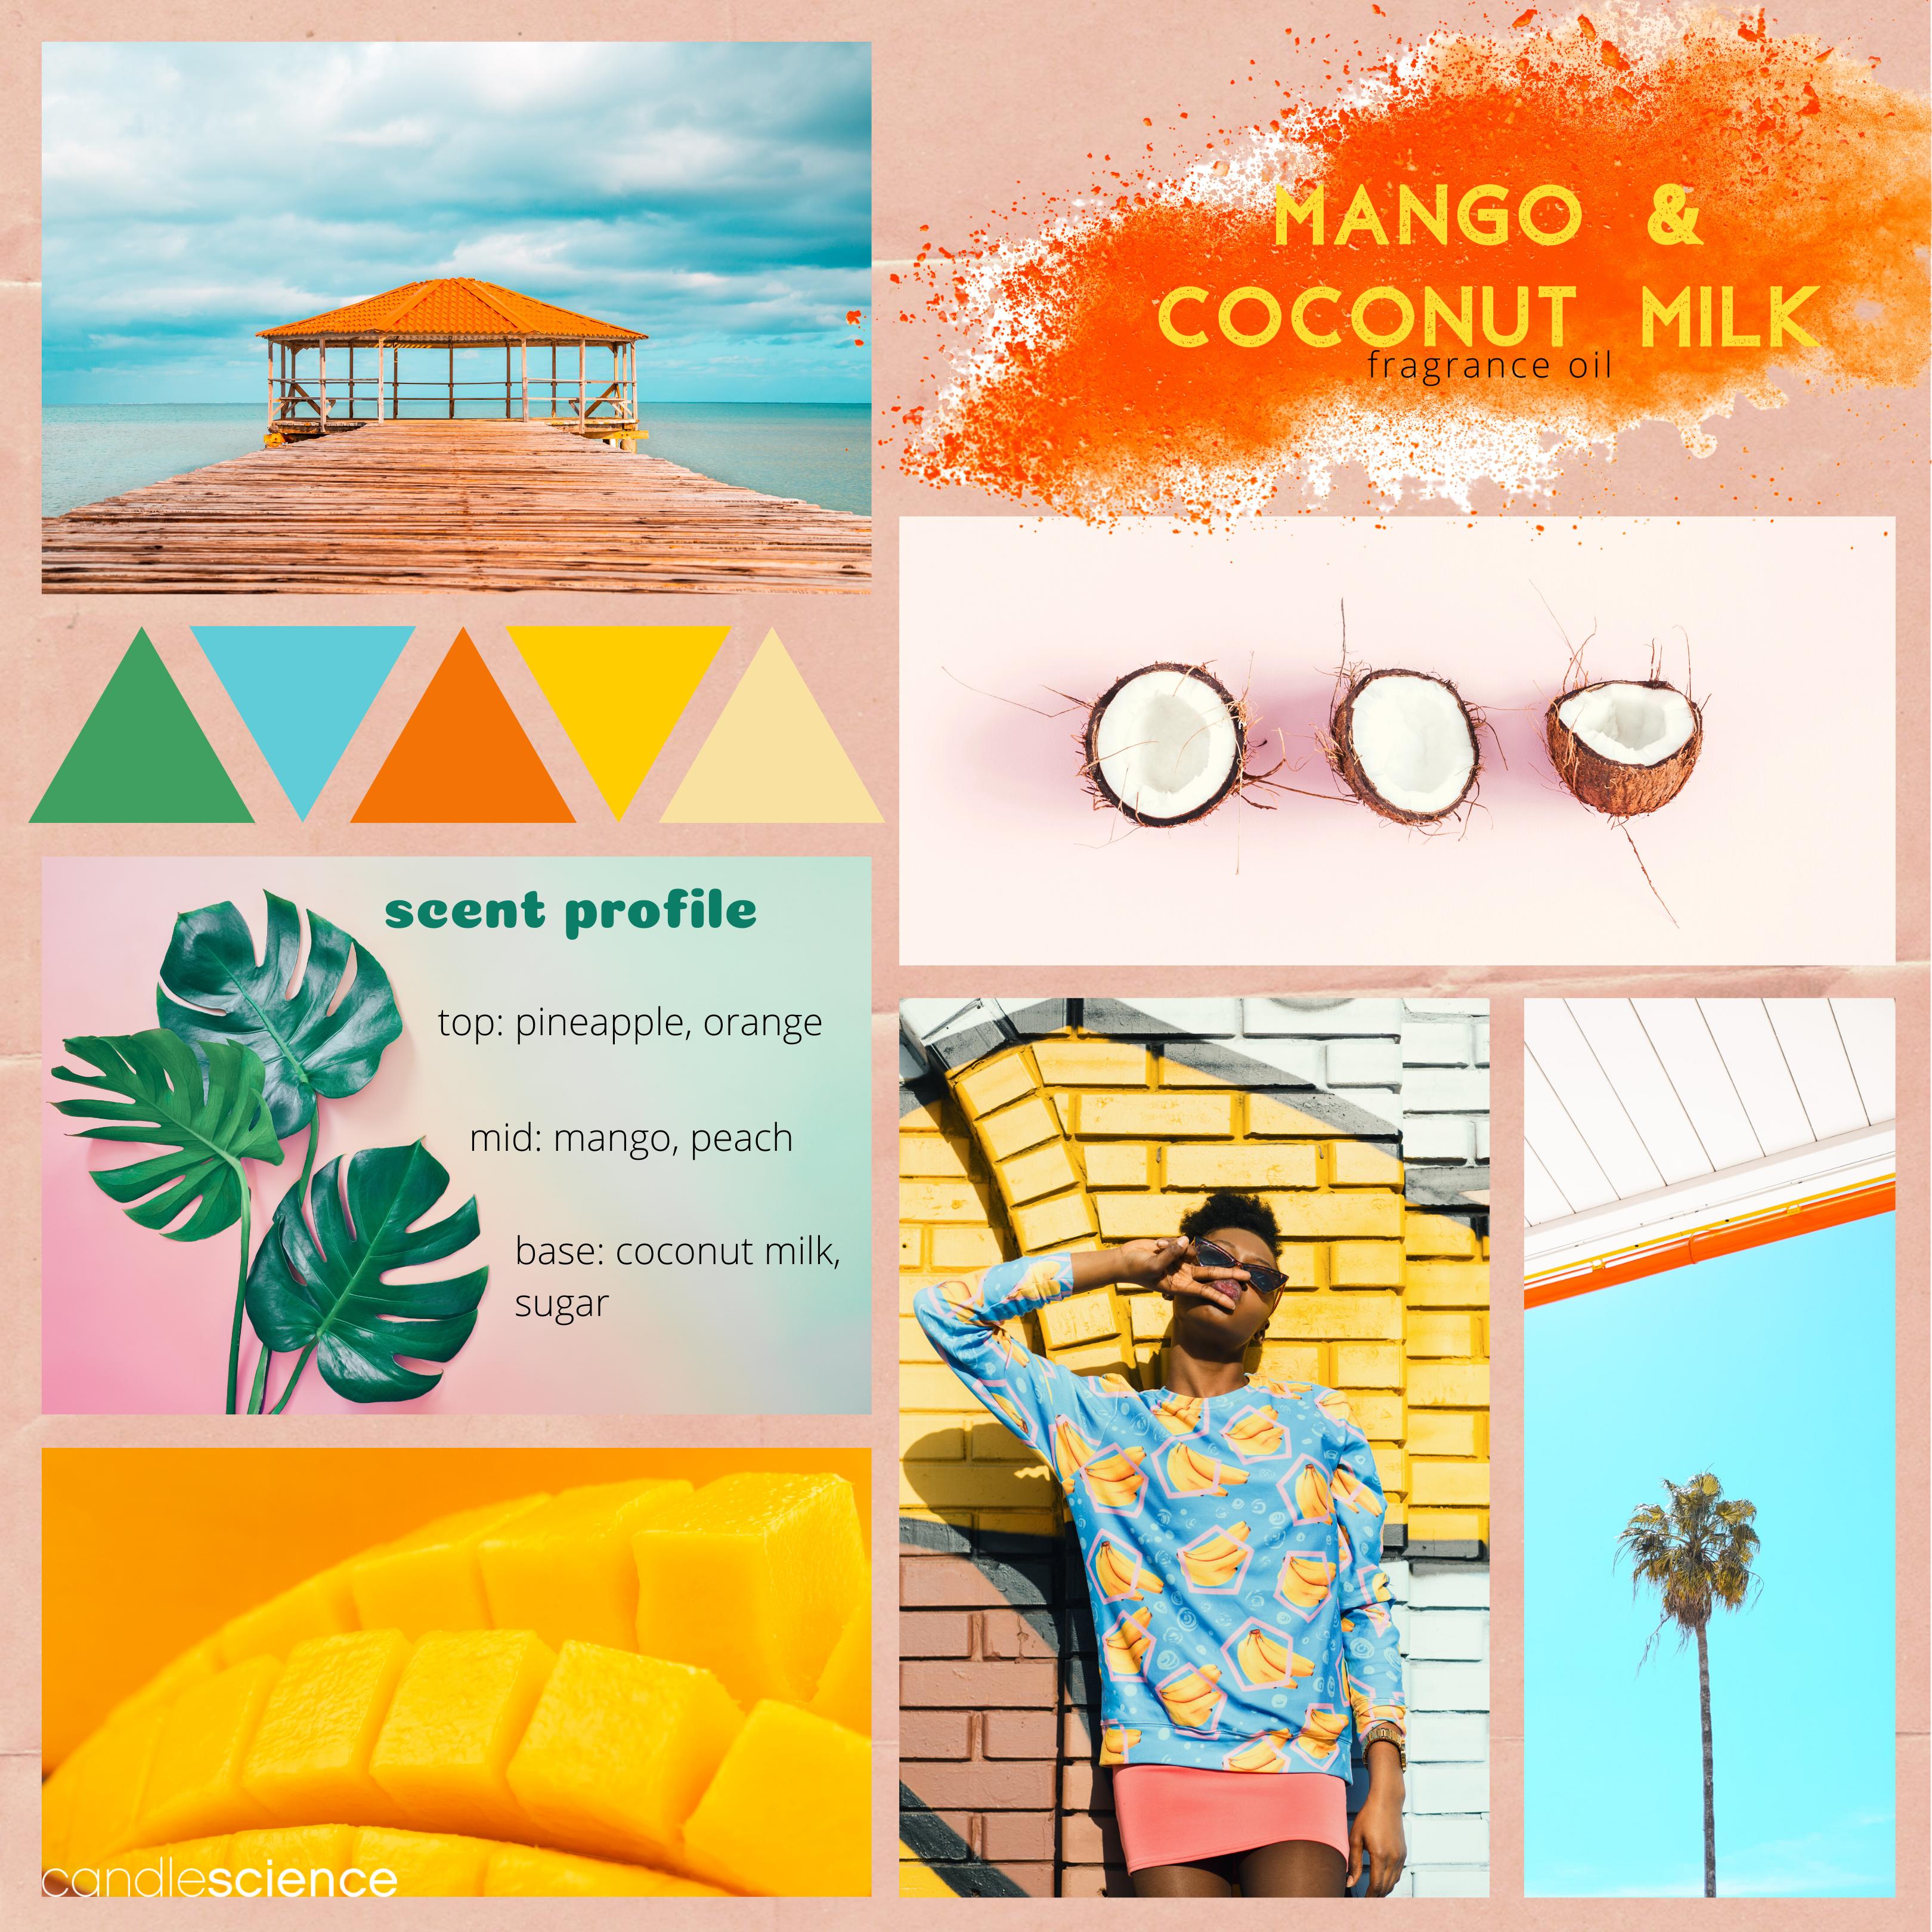 Mango and Coconut Milk fragrance oil mood board